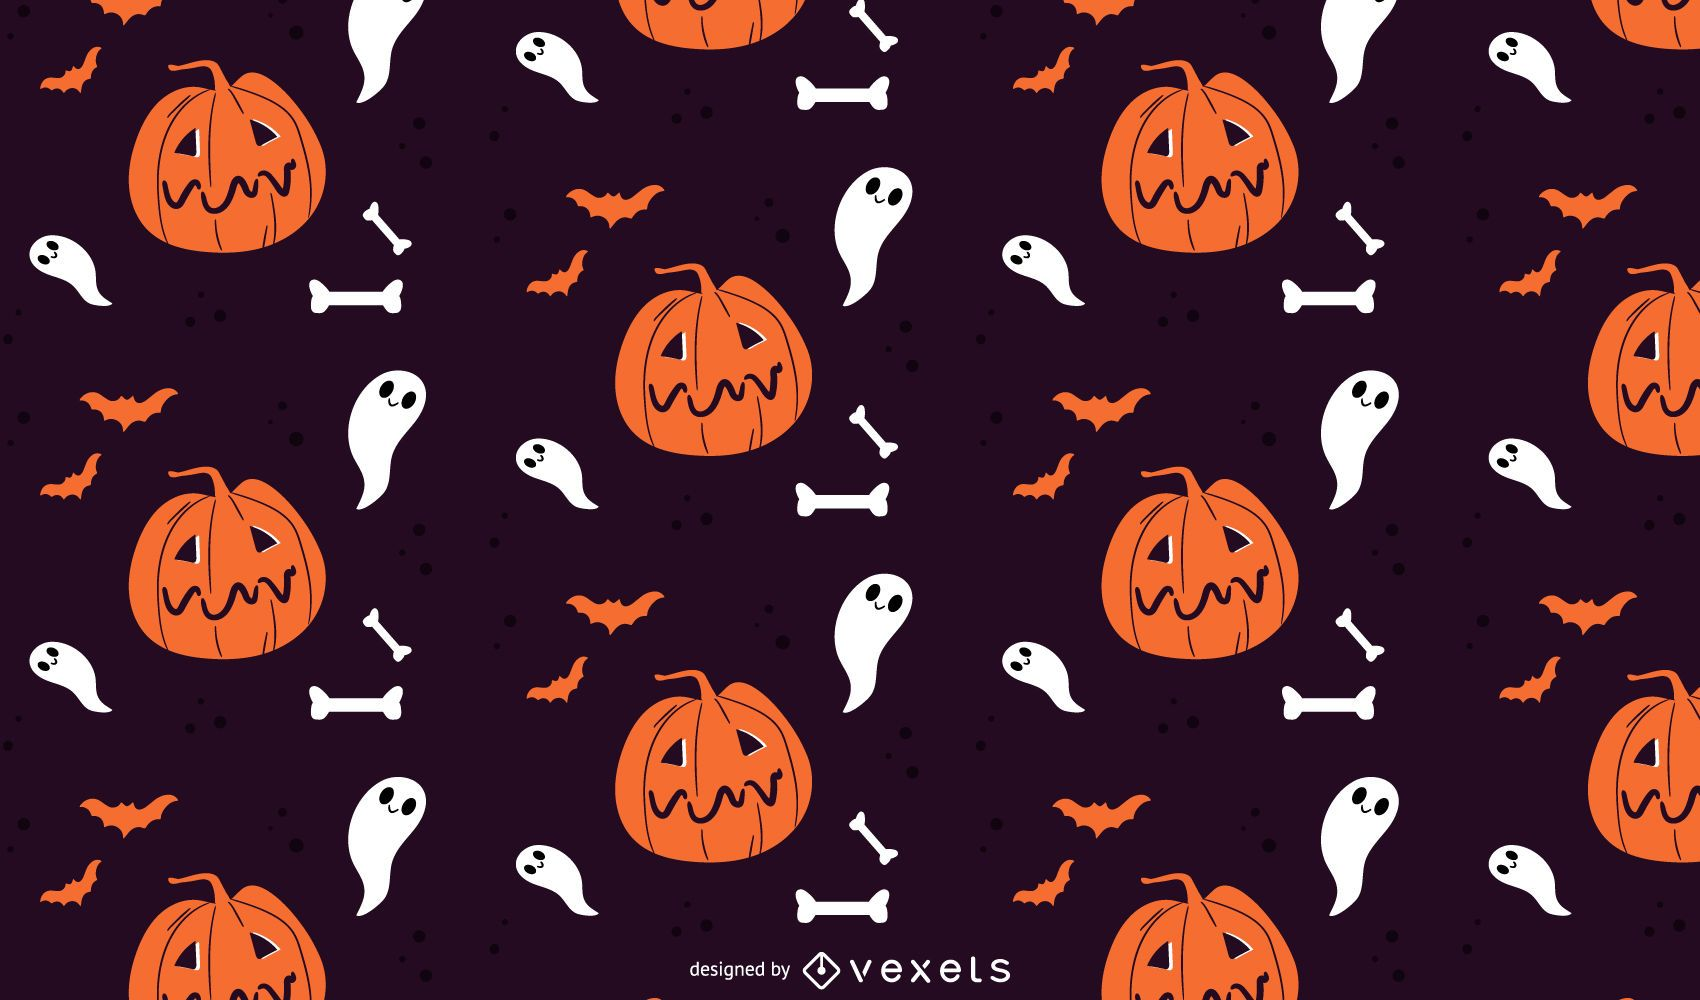 Pumpkins and ghosts halloween pattern